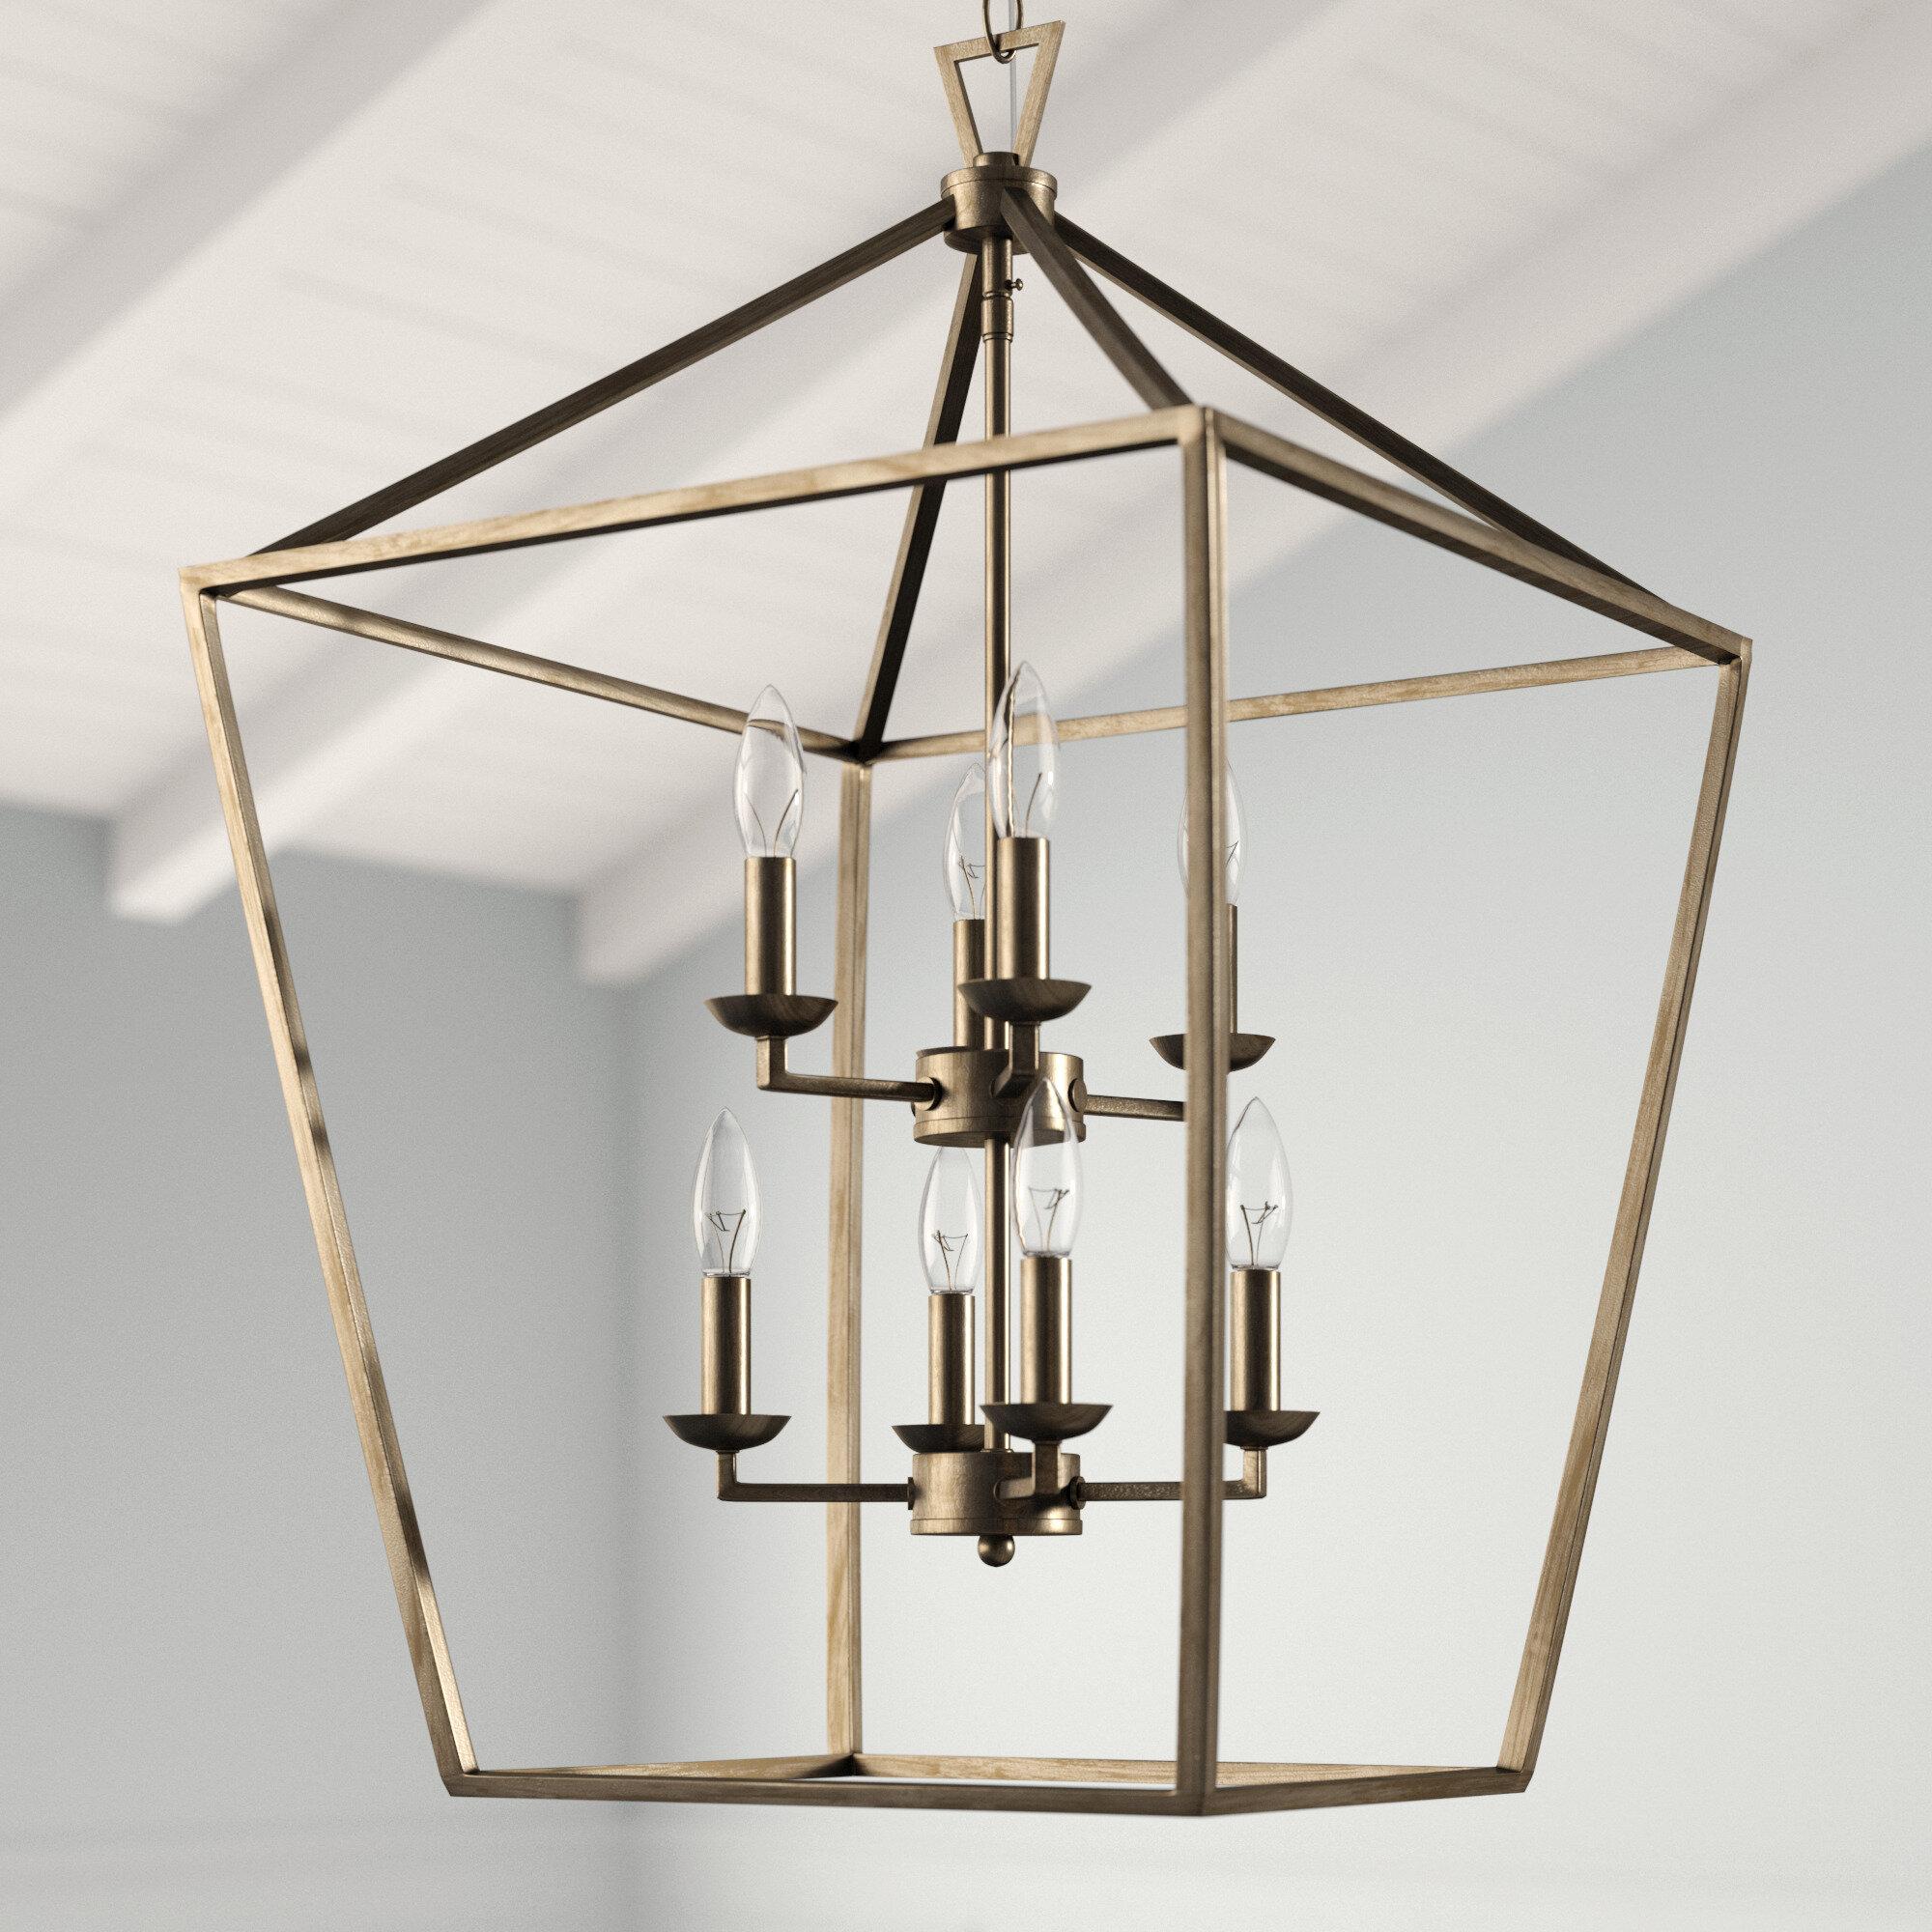 Carmen 8-Light Lantern Geometric Pendant for Odie 8-Light Lantern Square / Rectangle Pendants (Image 4 of 30)